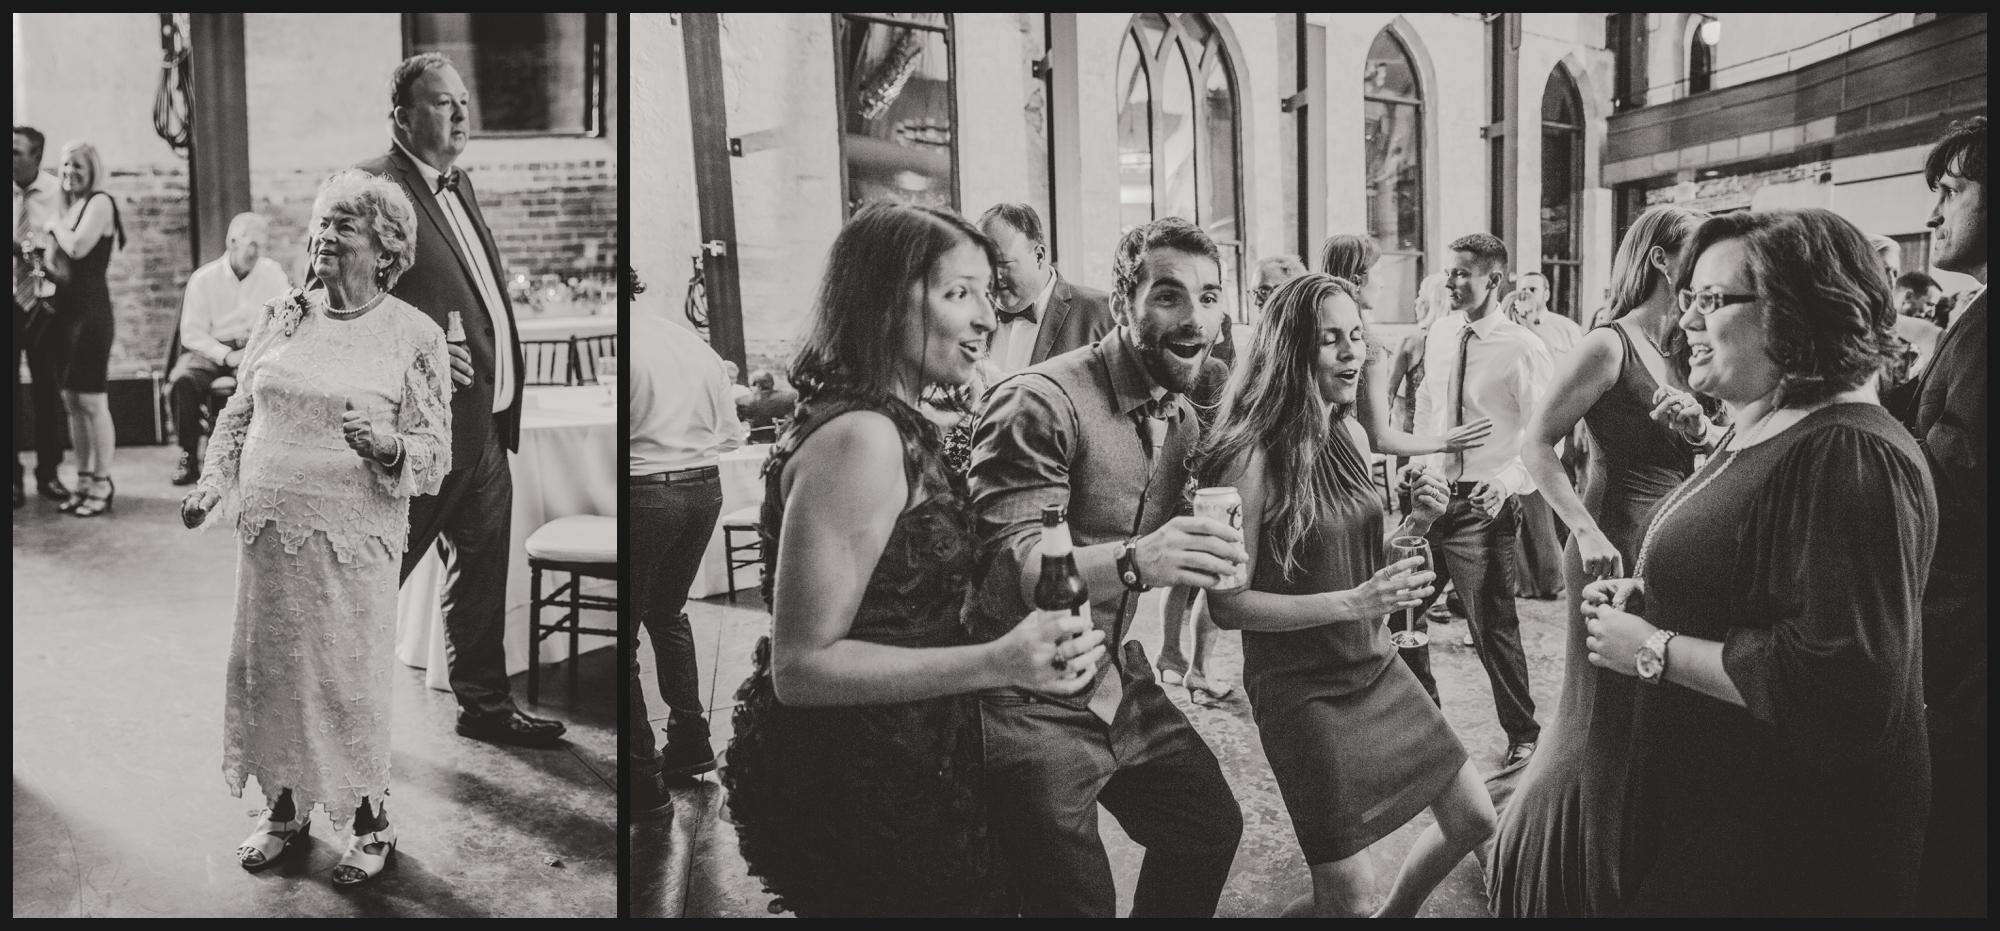 Orlando-Wedding-Photographer-destination-wedding-photographer-florida-wedding-photographer-bohemian-wedding-photographer_0570.jpg